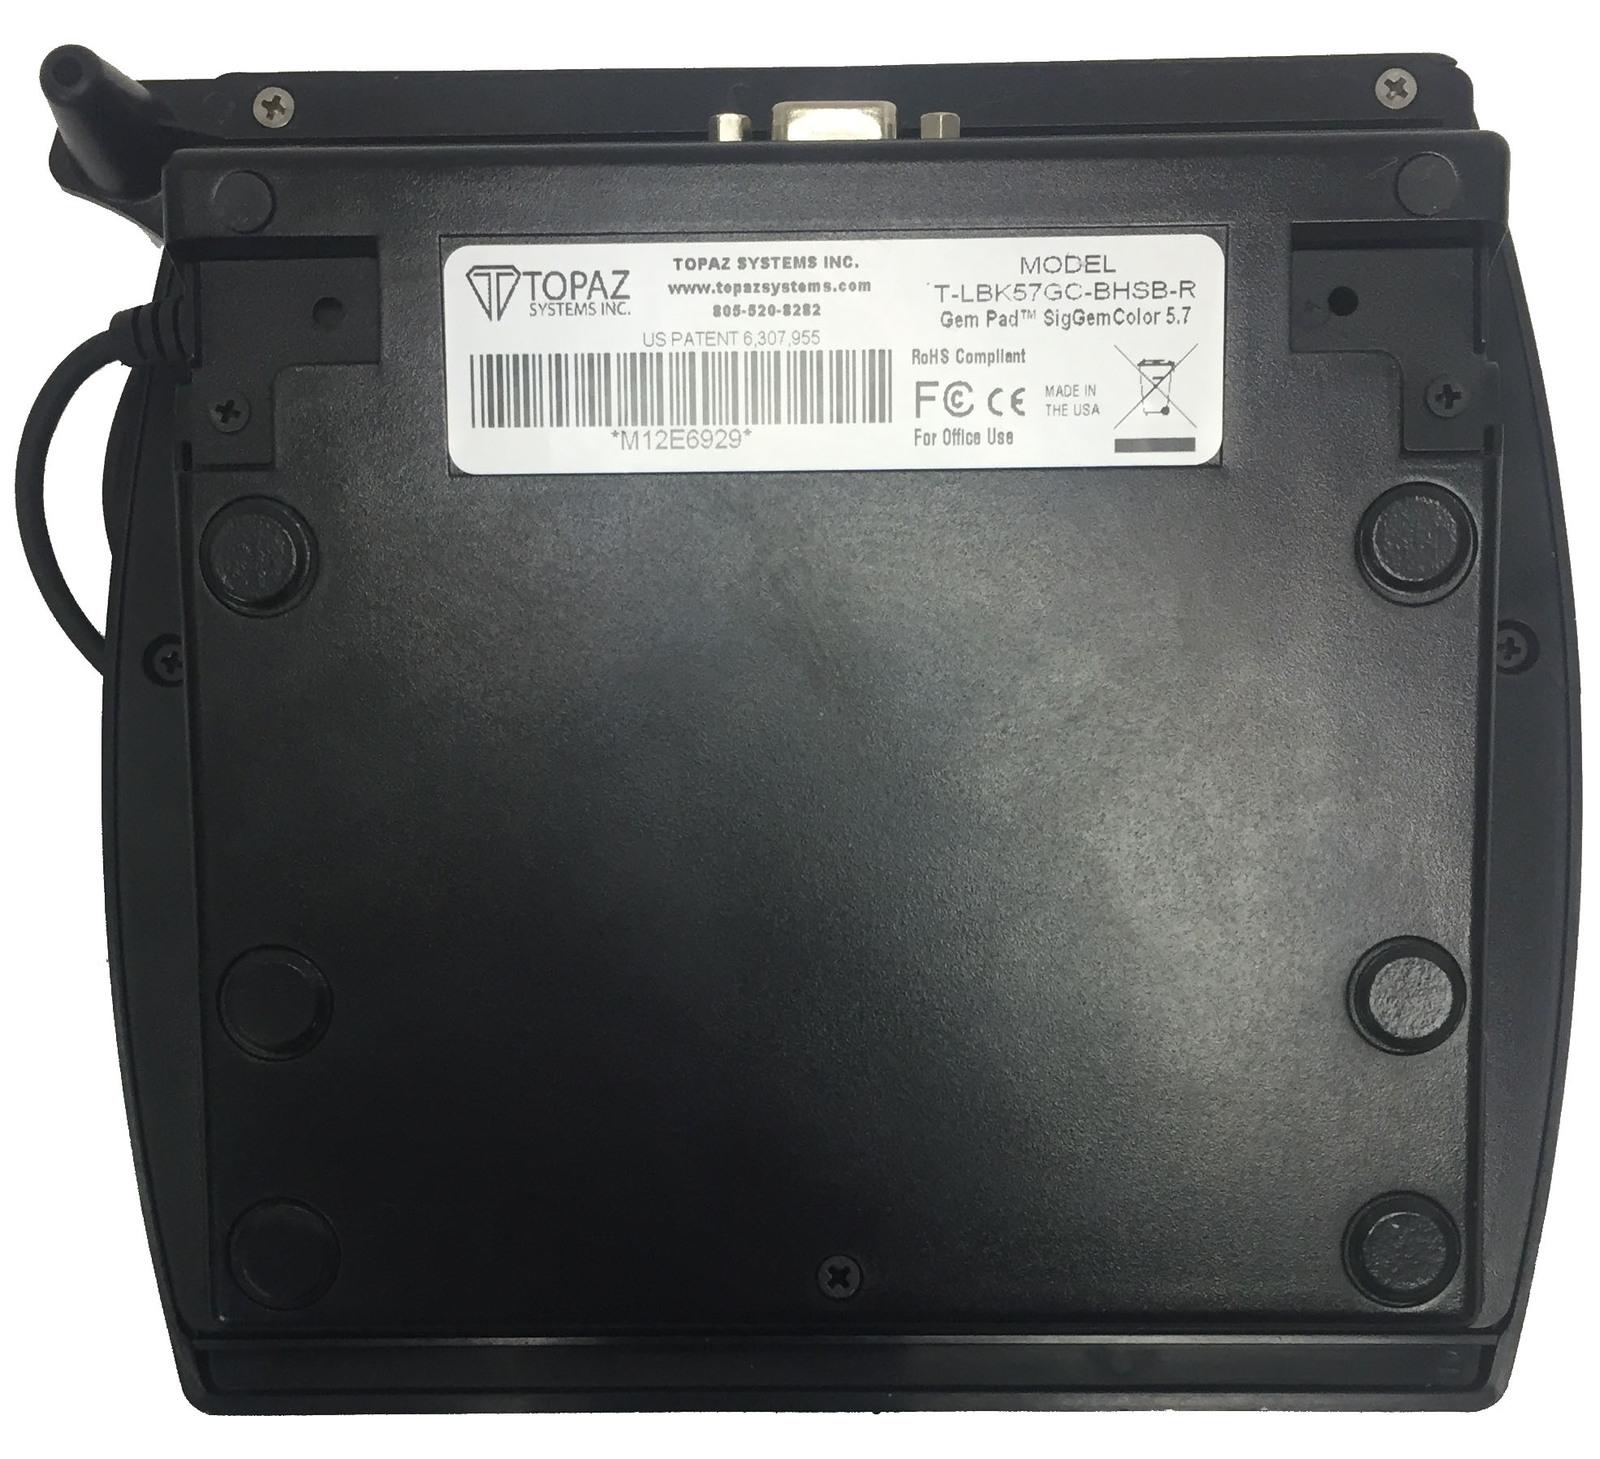 Topaz SigGemColor T-LBK57GC-BHSB-R Electronic Signature Pad Bin:7